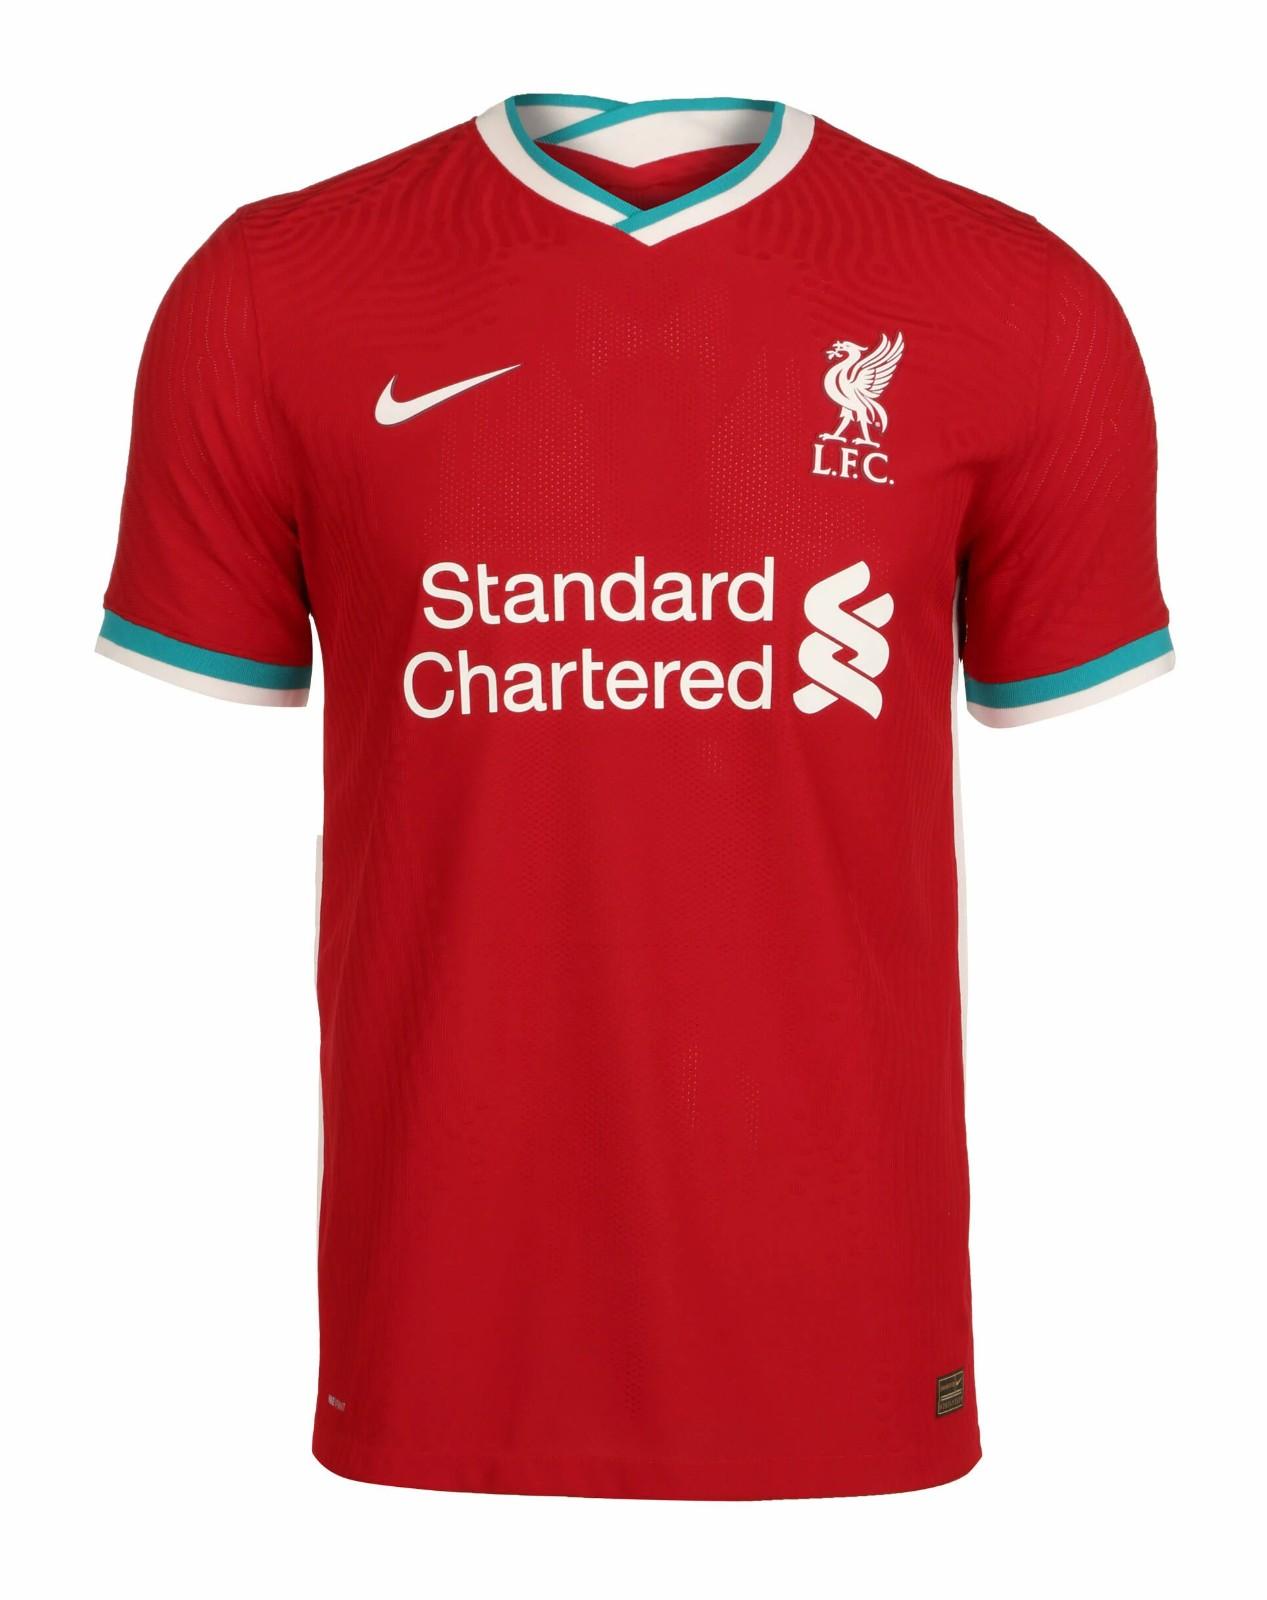 Liverpool FC 2020-21 Home Kit